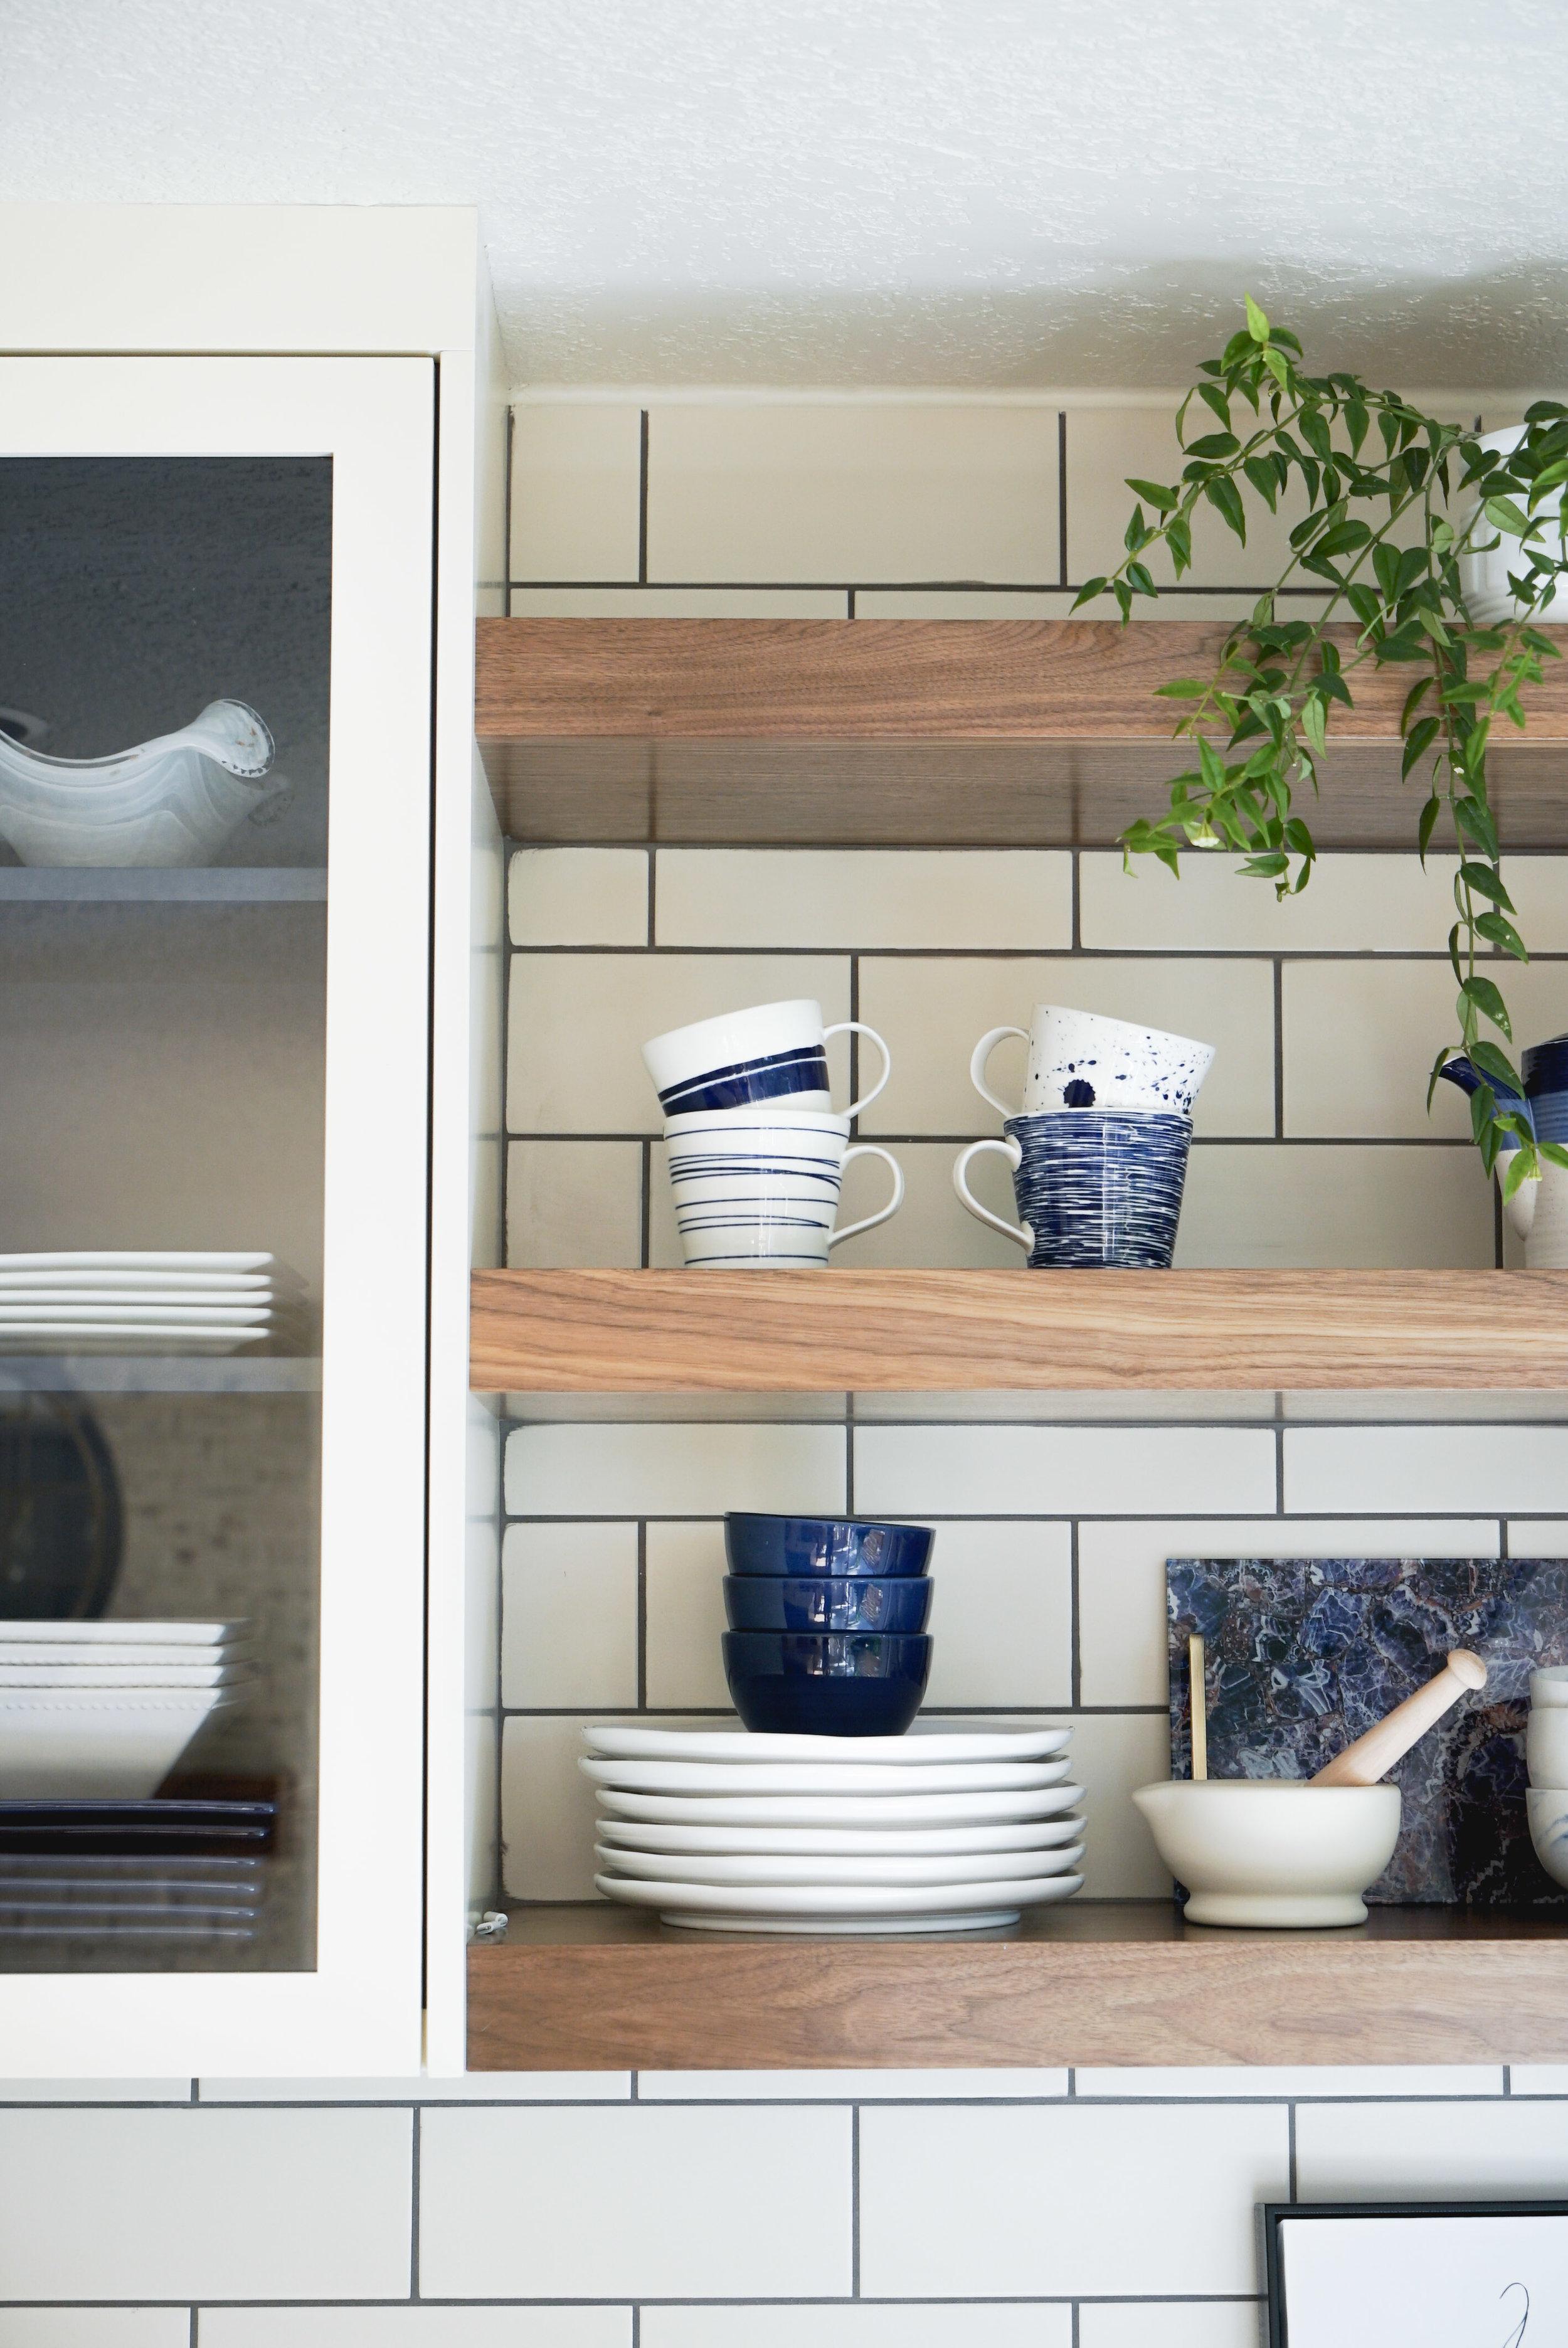 Blue details through out the kitchen shelves